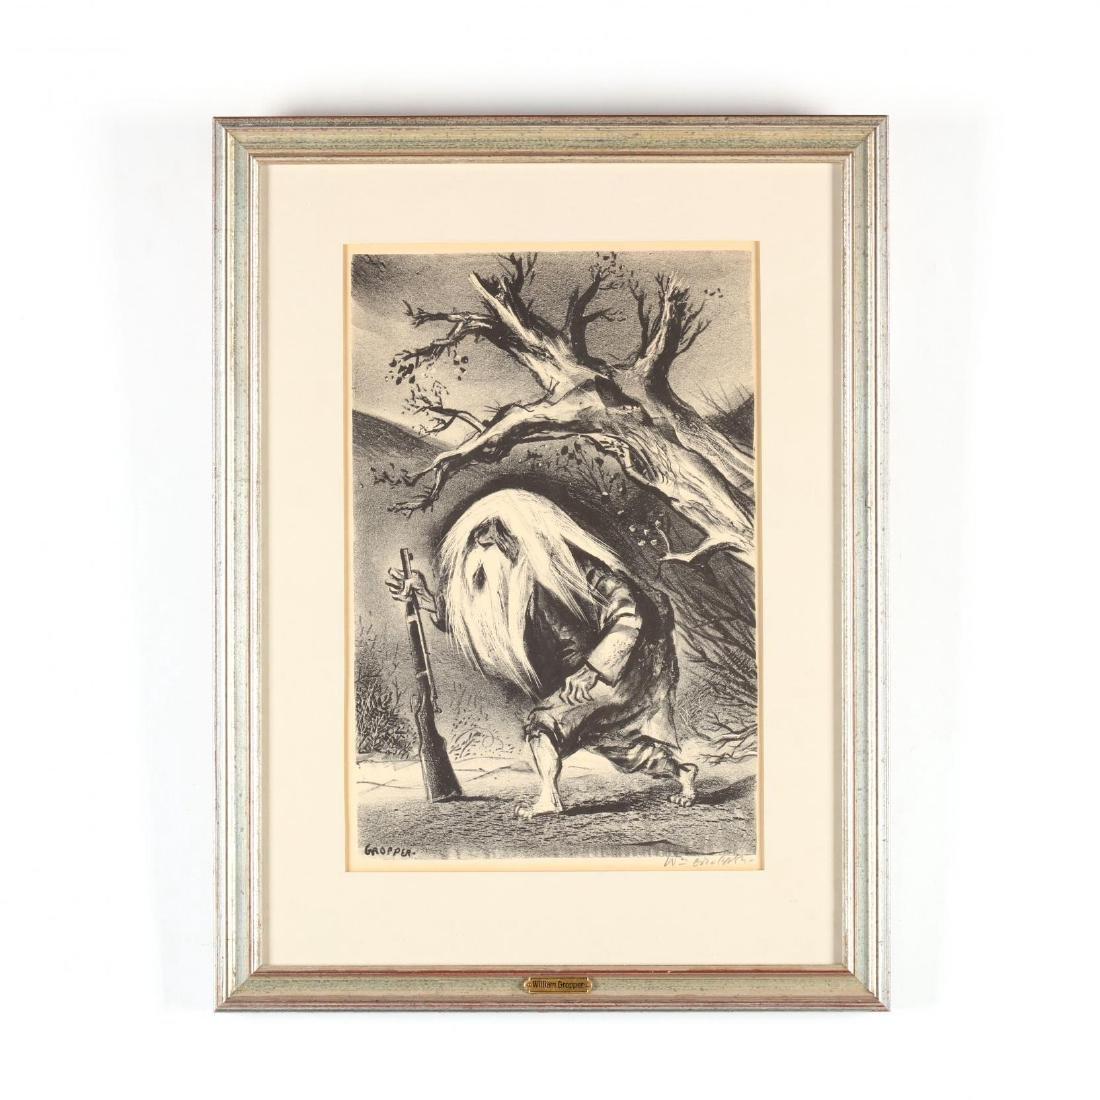 Two Framed Prints - Blake and Gropper - 6